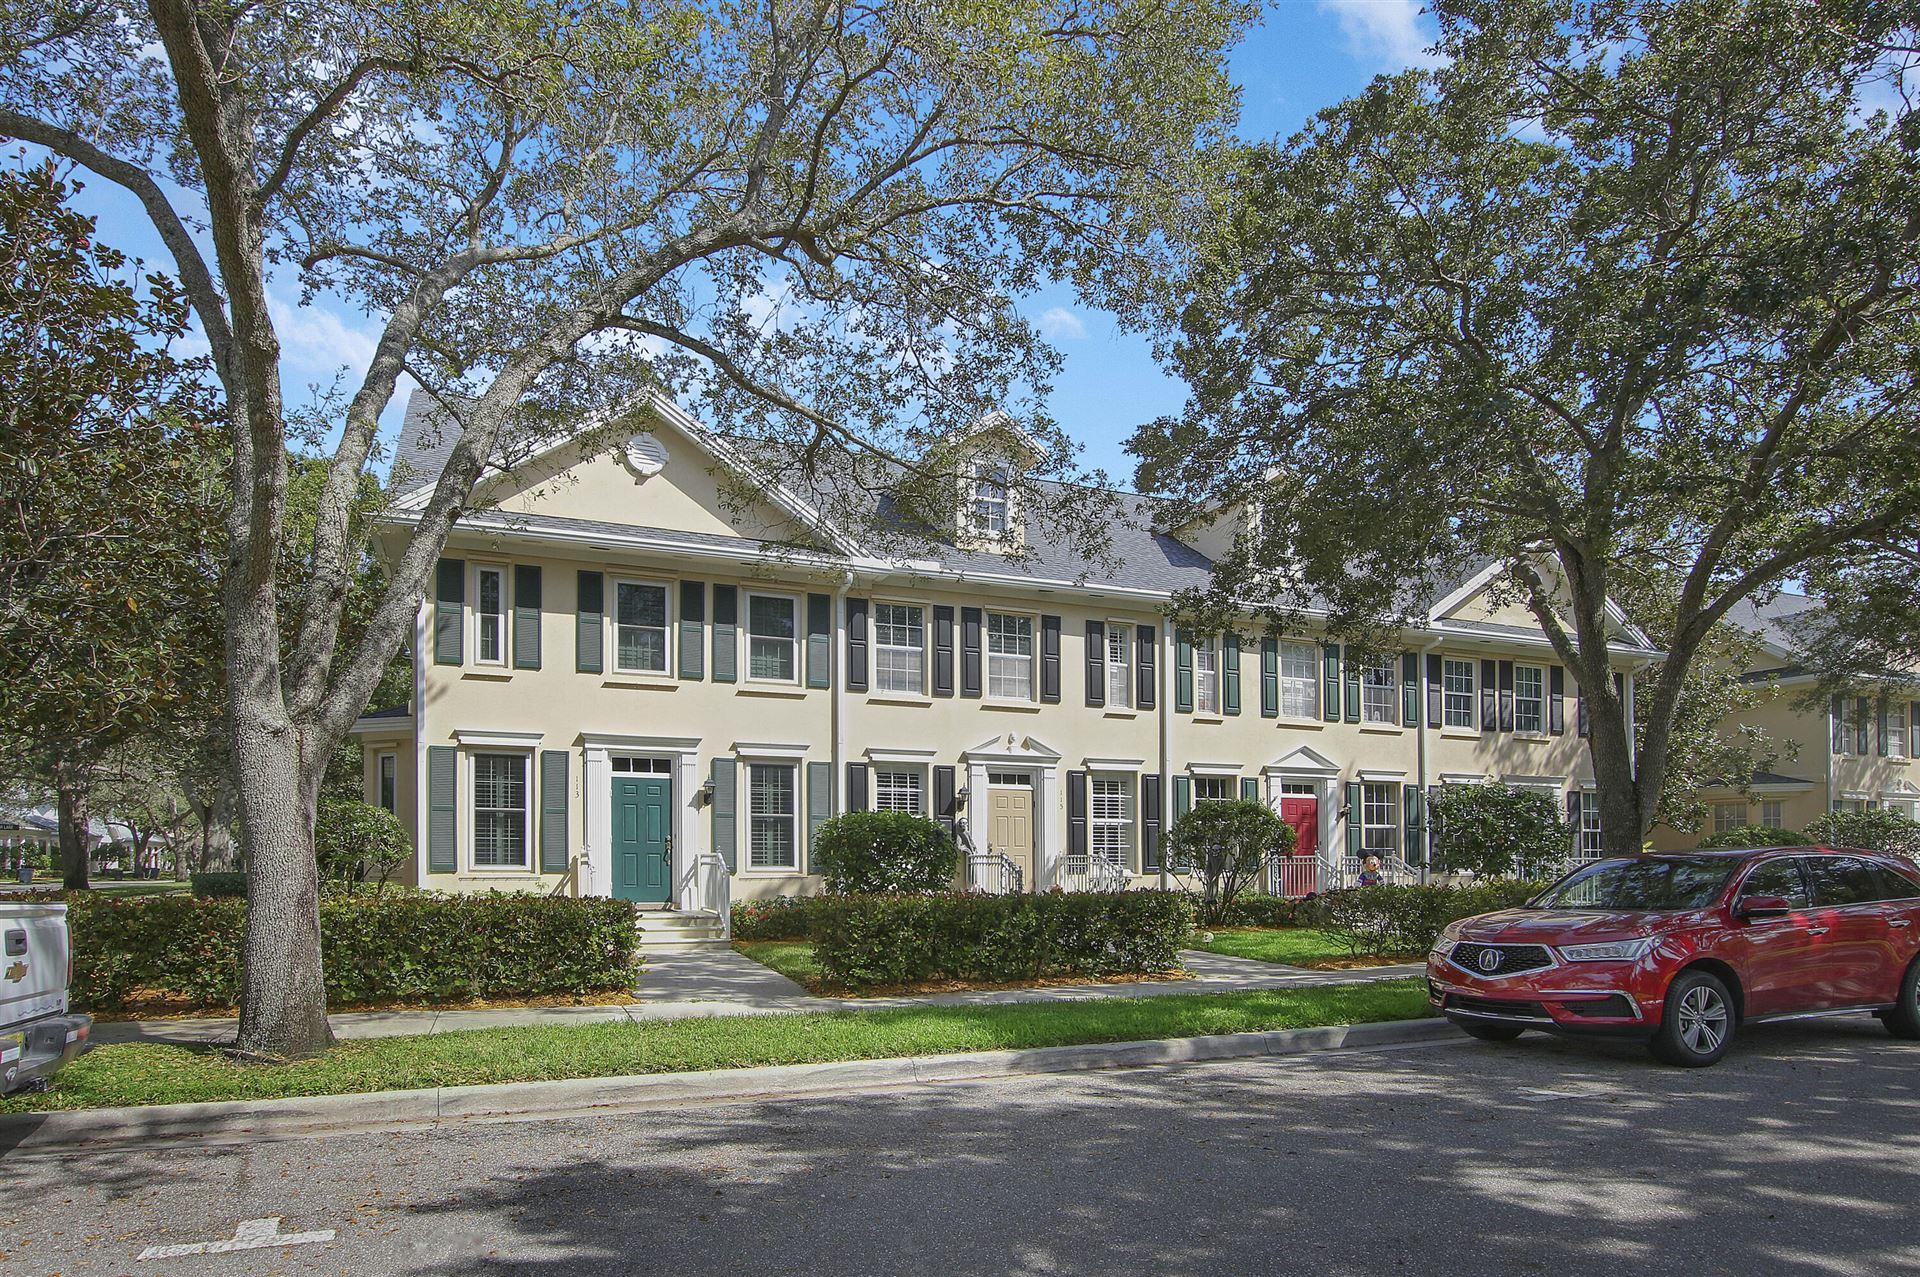 Photo of 115 Bishopwood Drive, Jupiter, FL 33458 (MLS # RX-10748921)